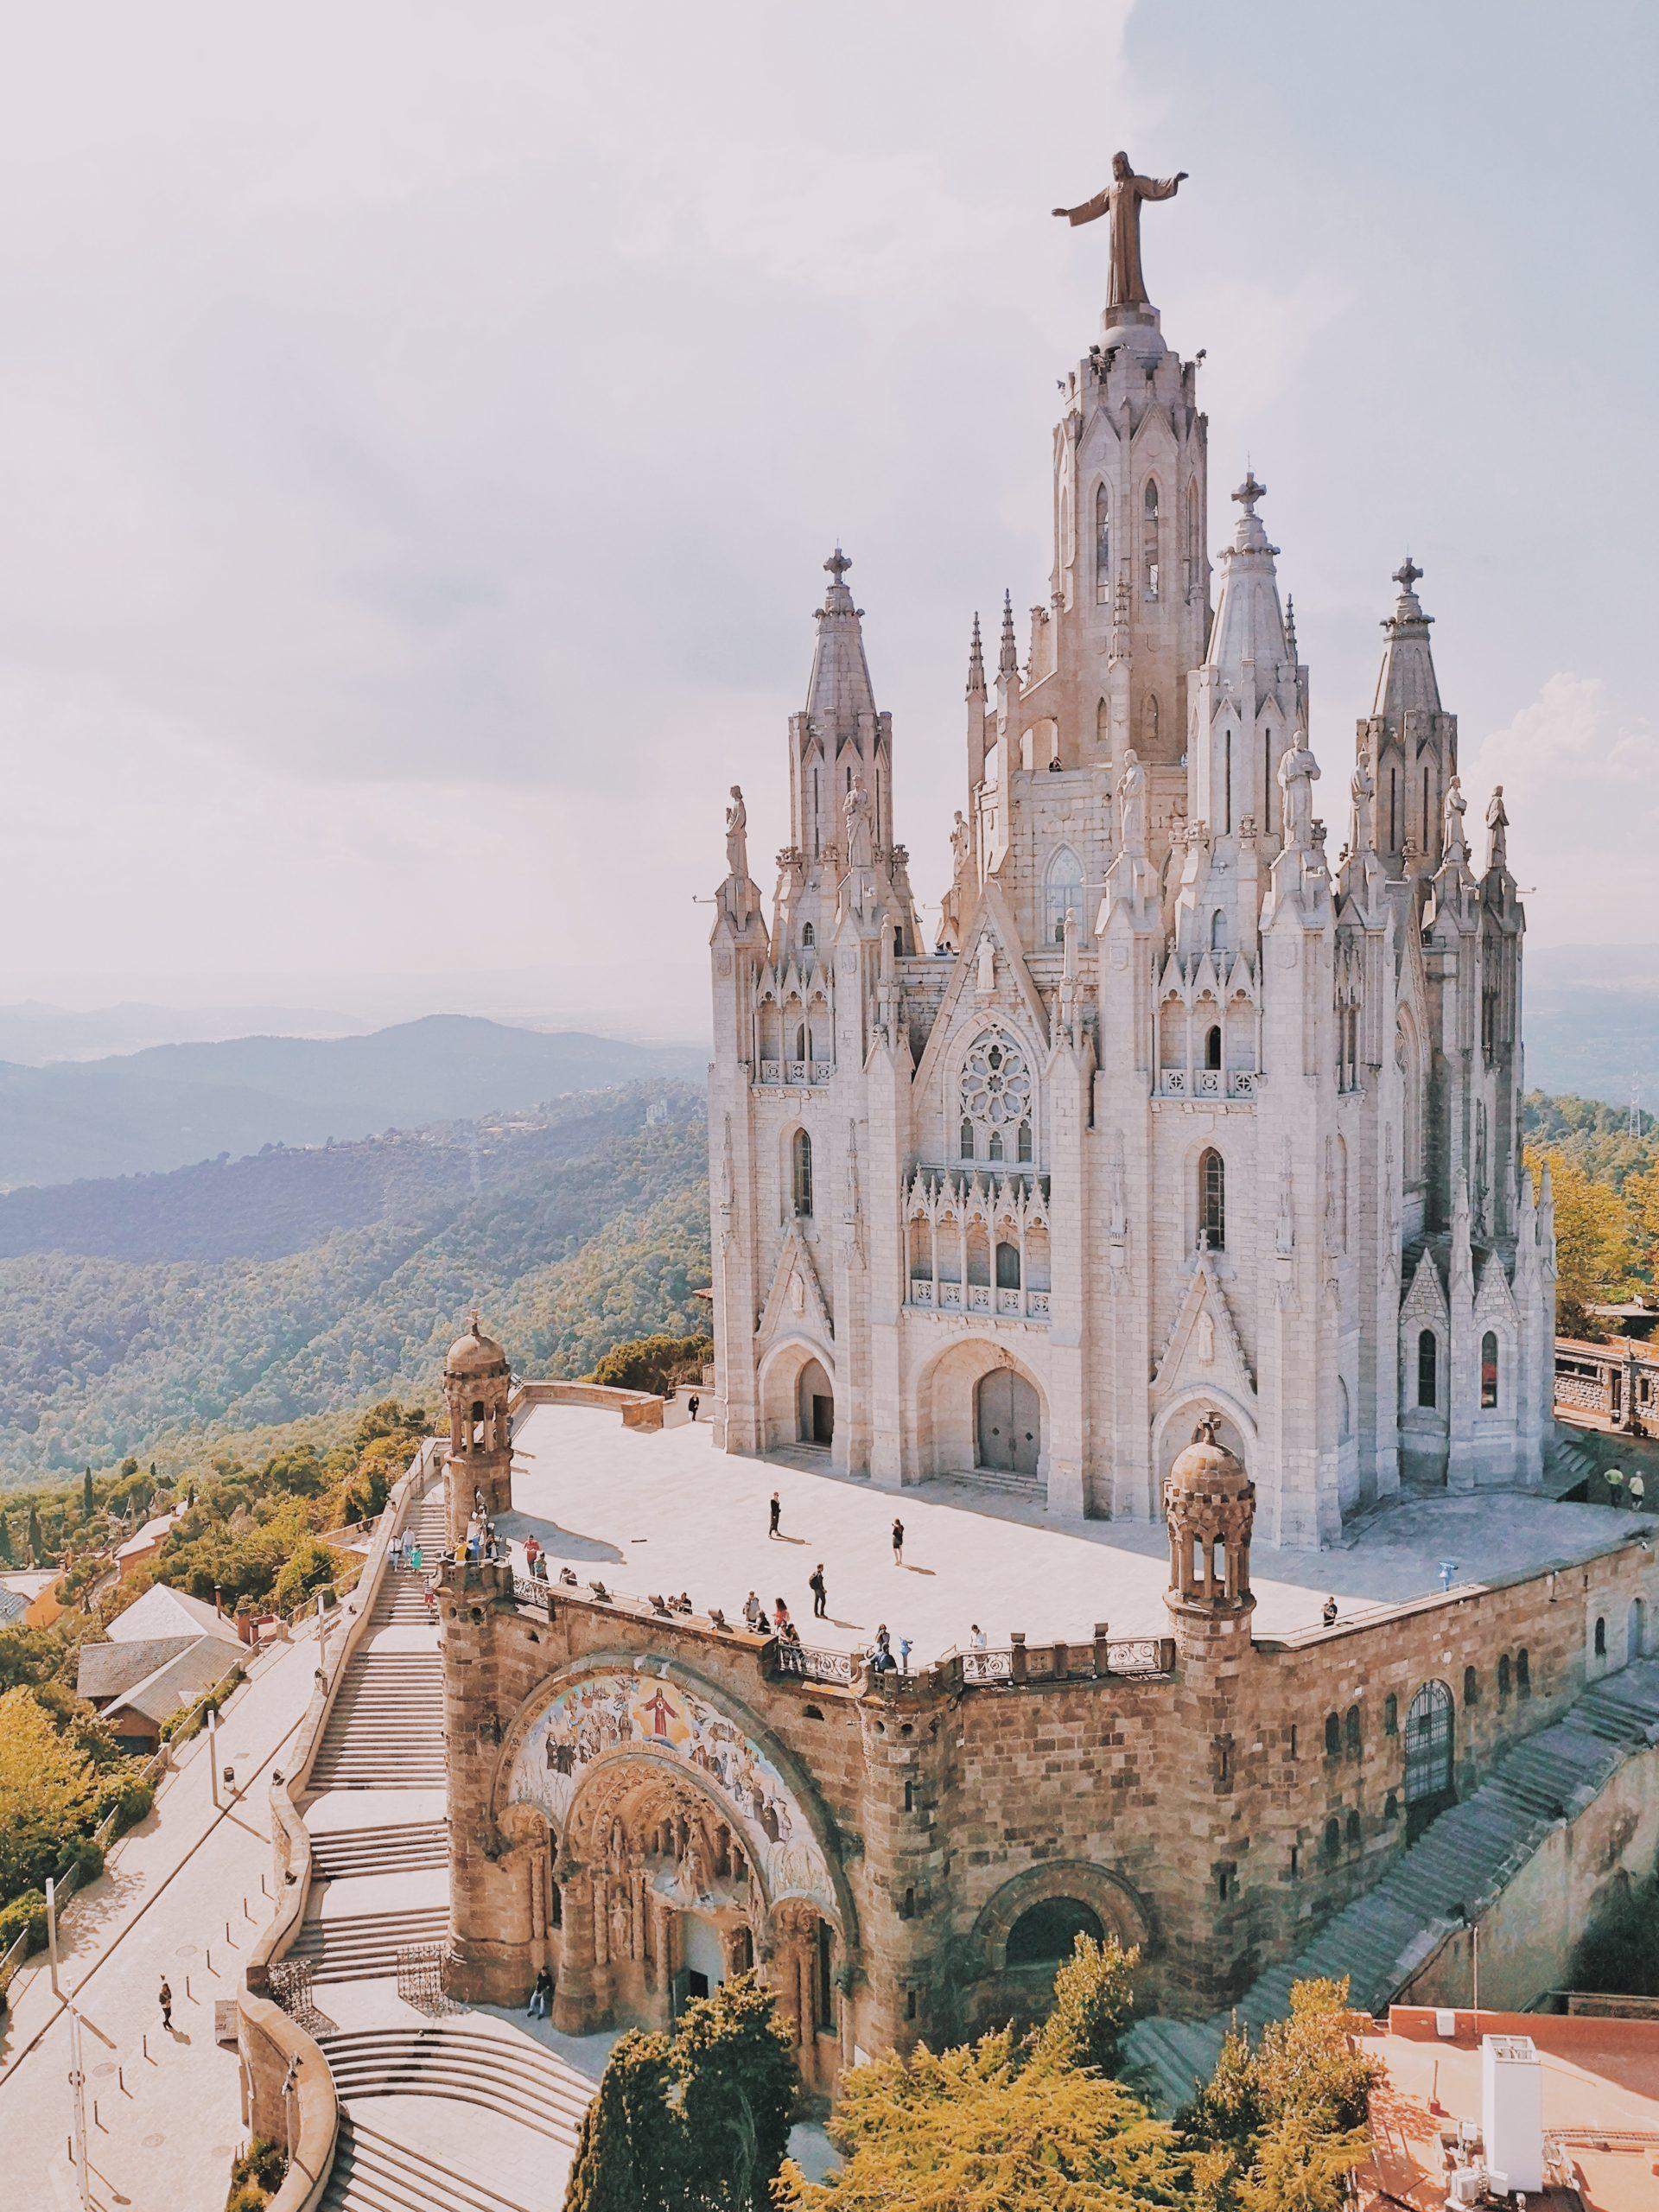 amusement park in barcelona spain